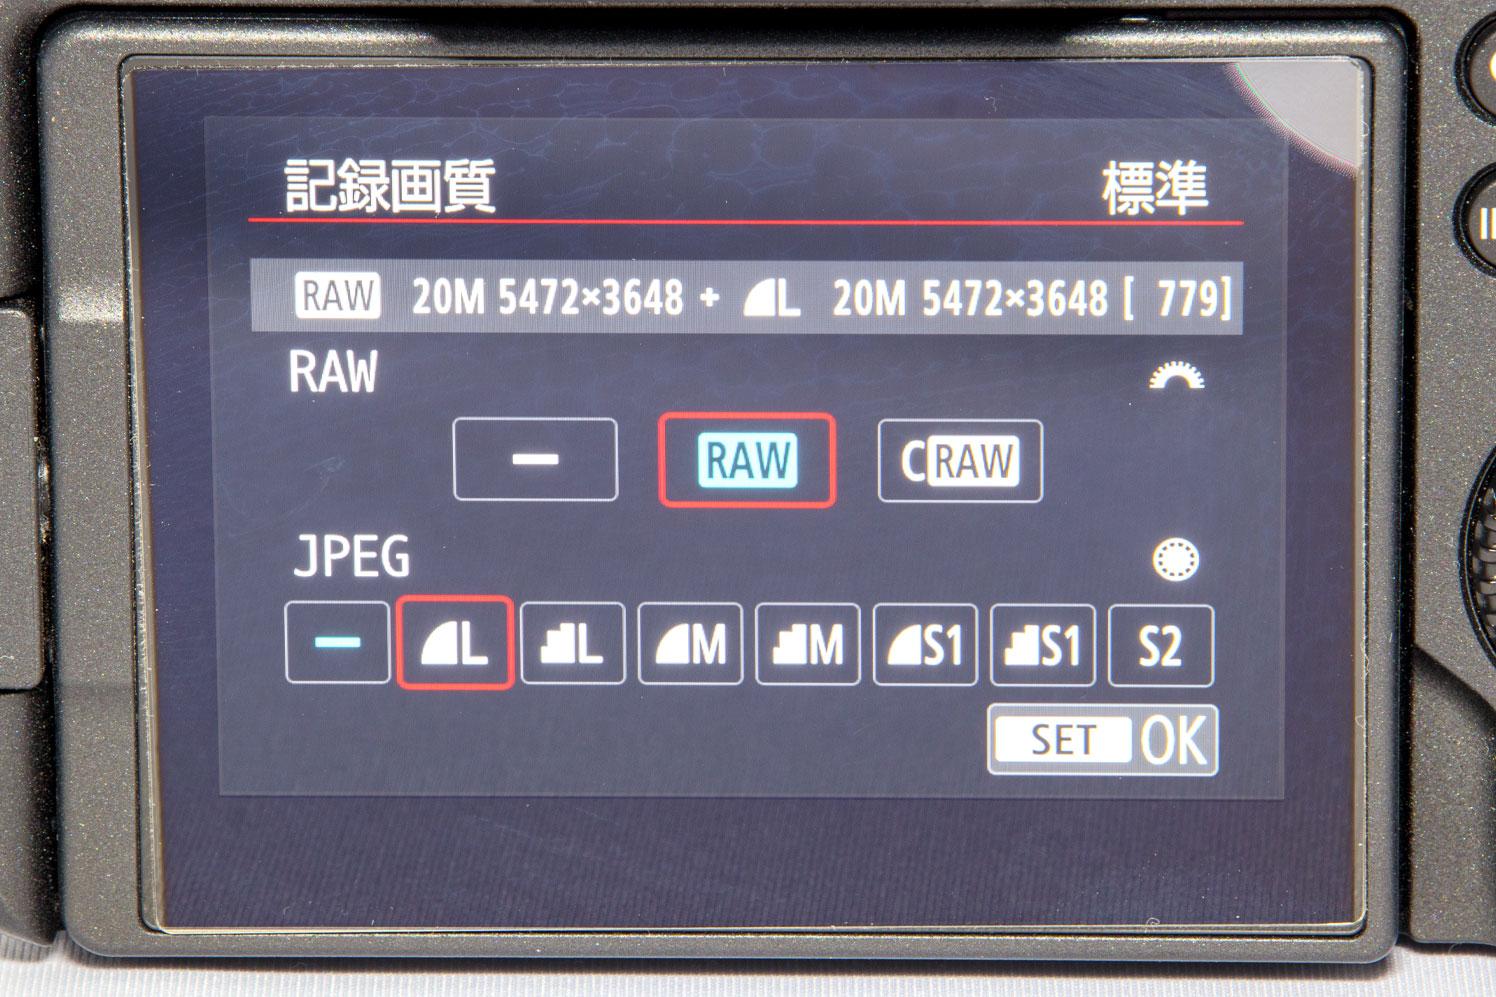 RAWとJPEGの記録設定